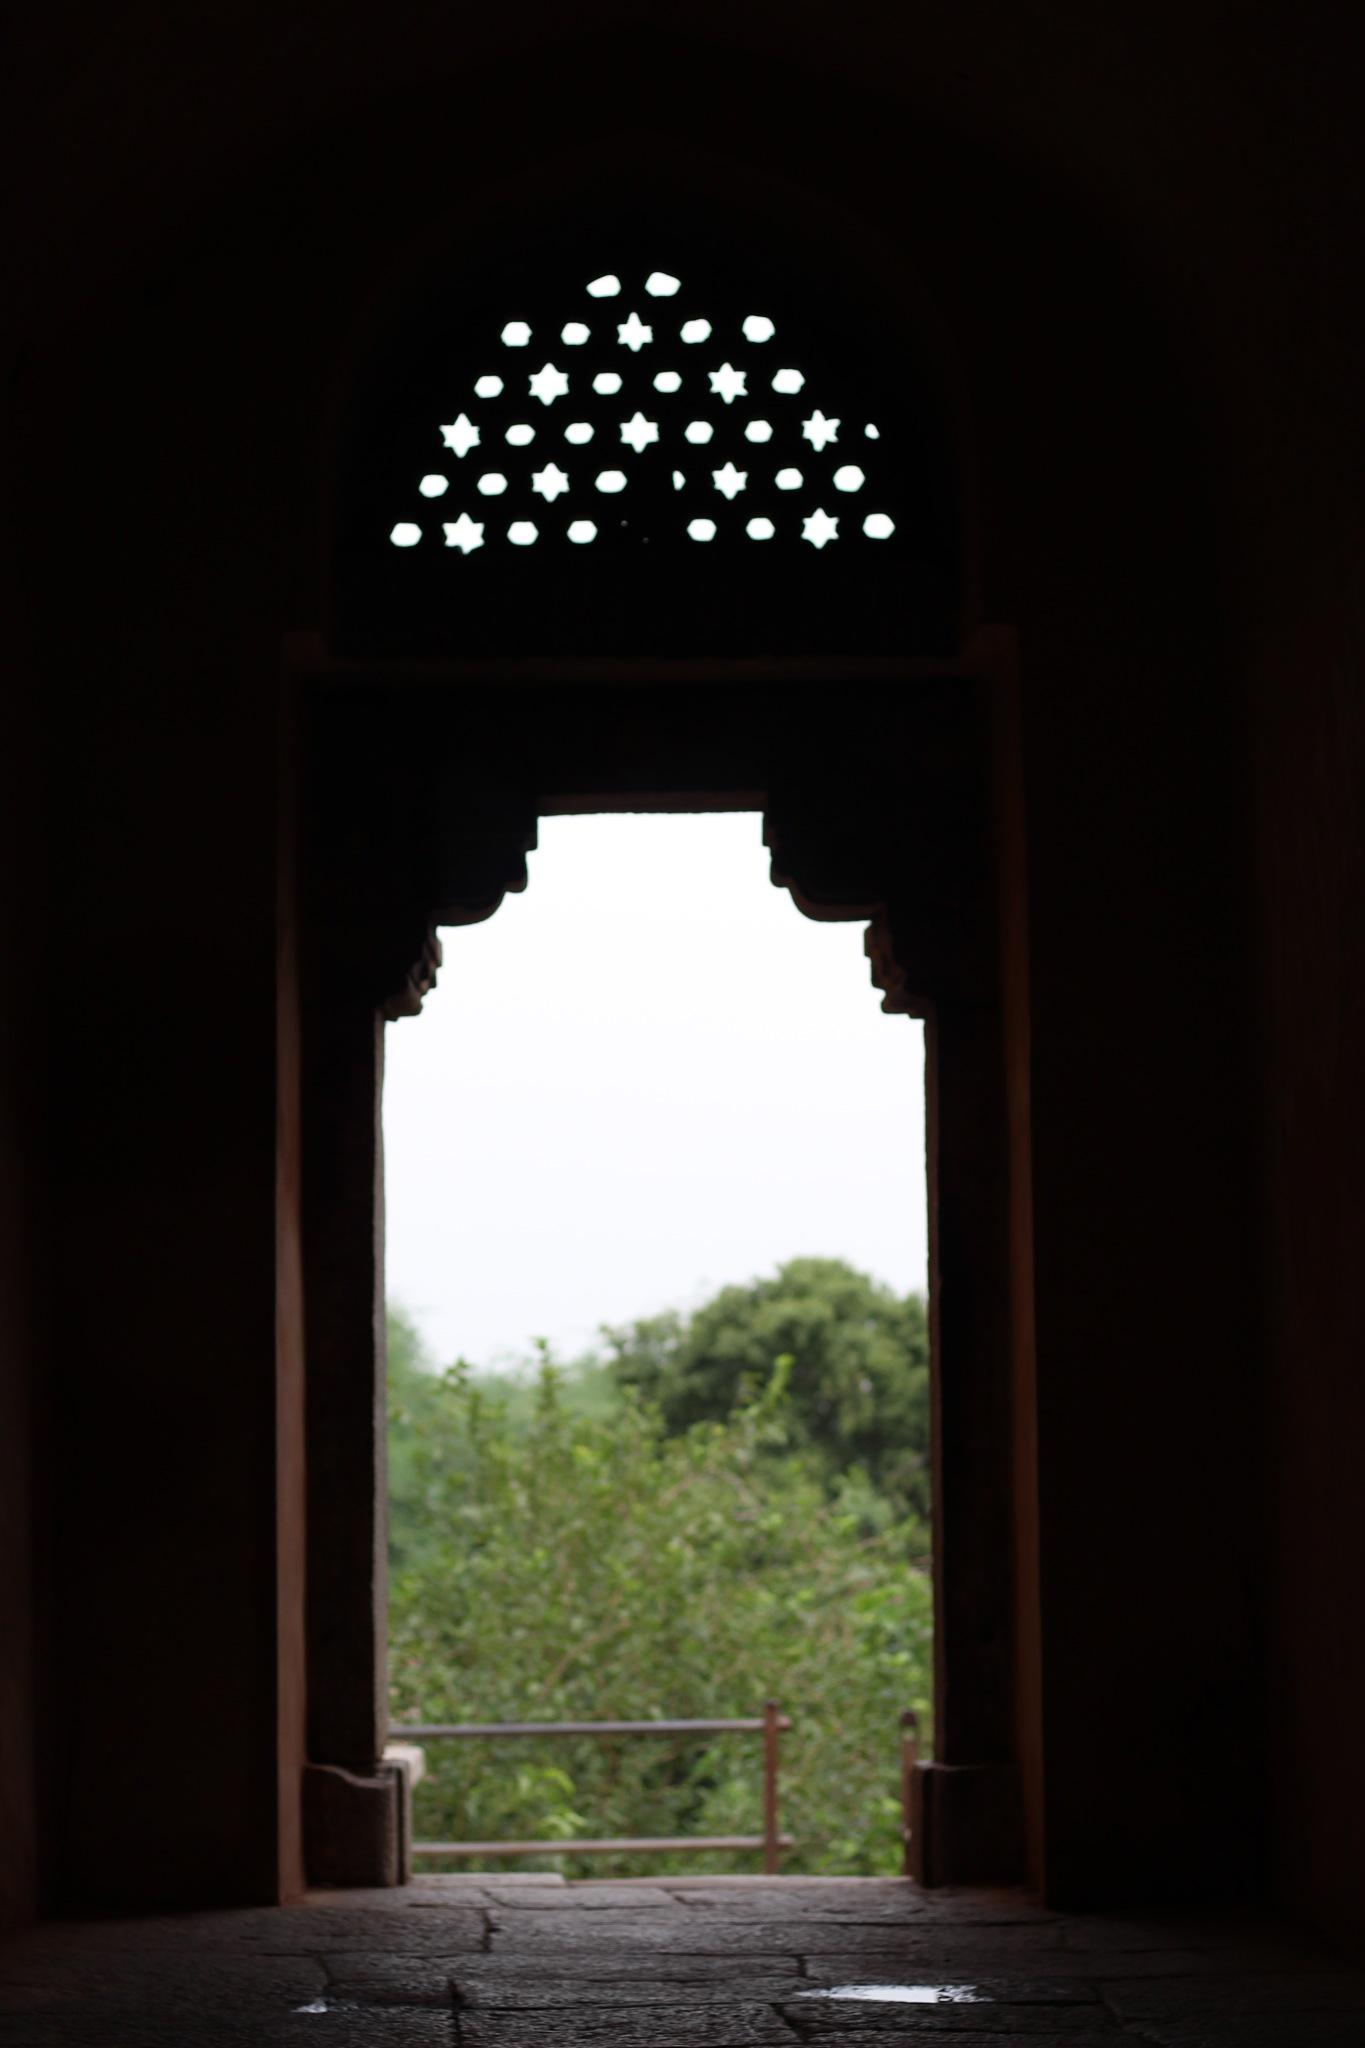 Pieceful place  by Gagandeep Singh